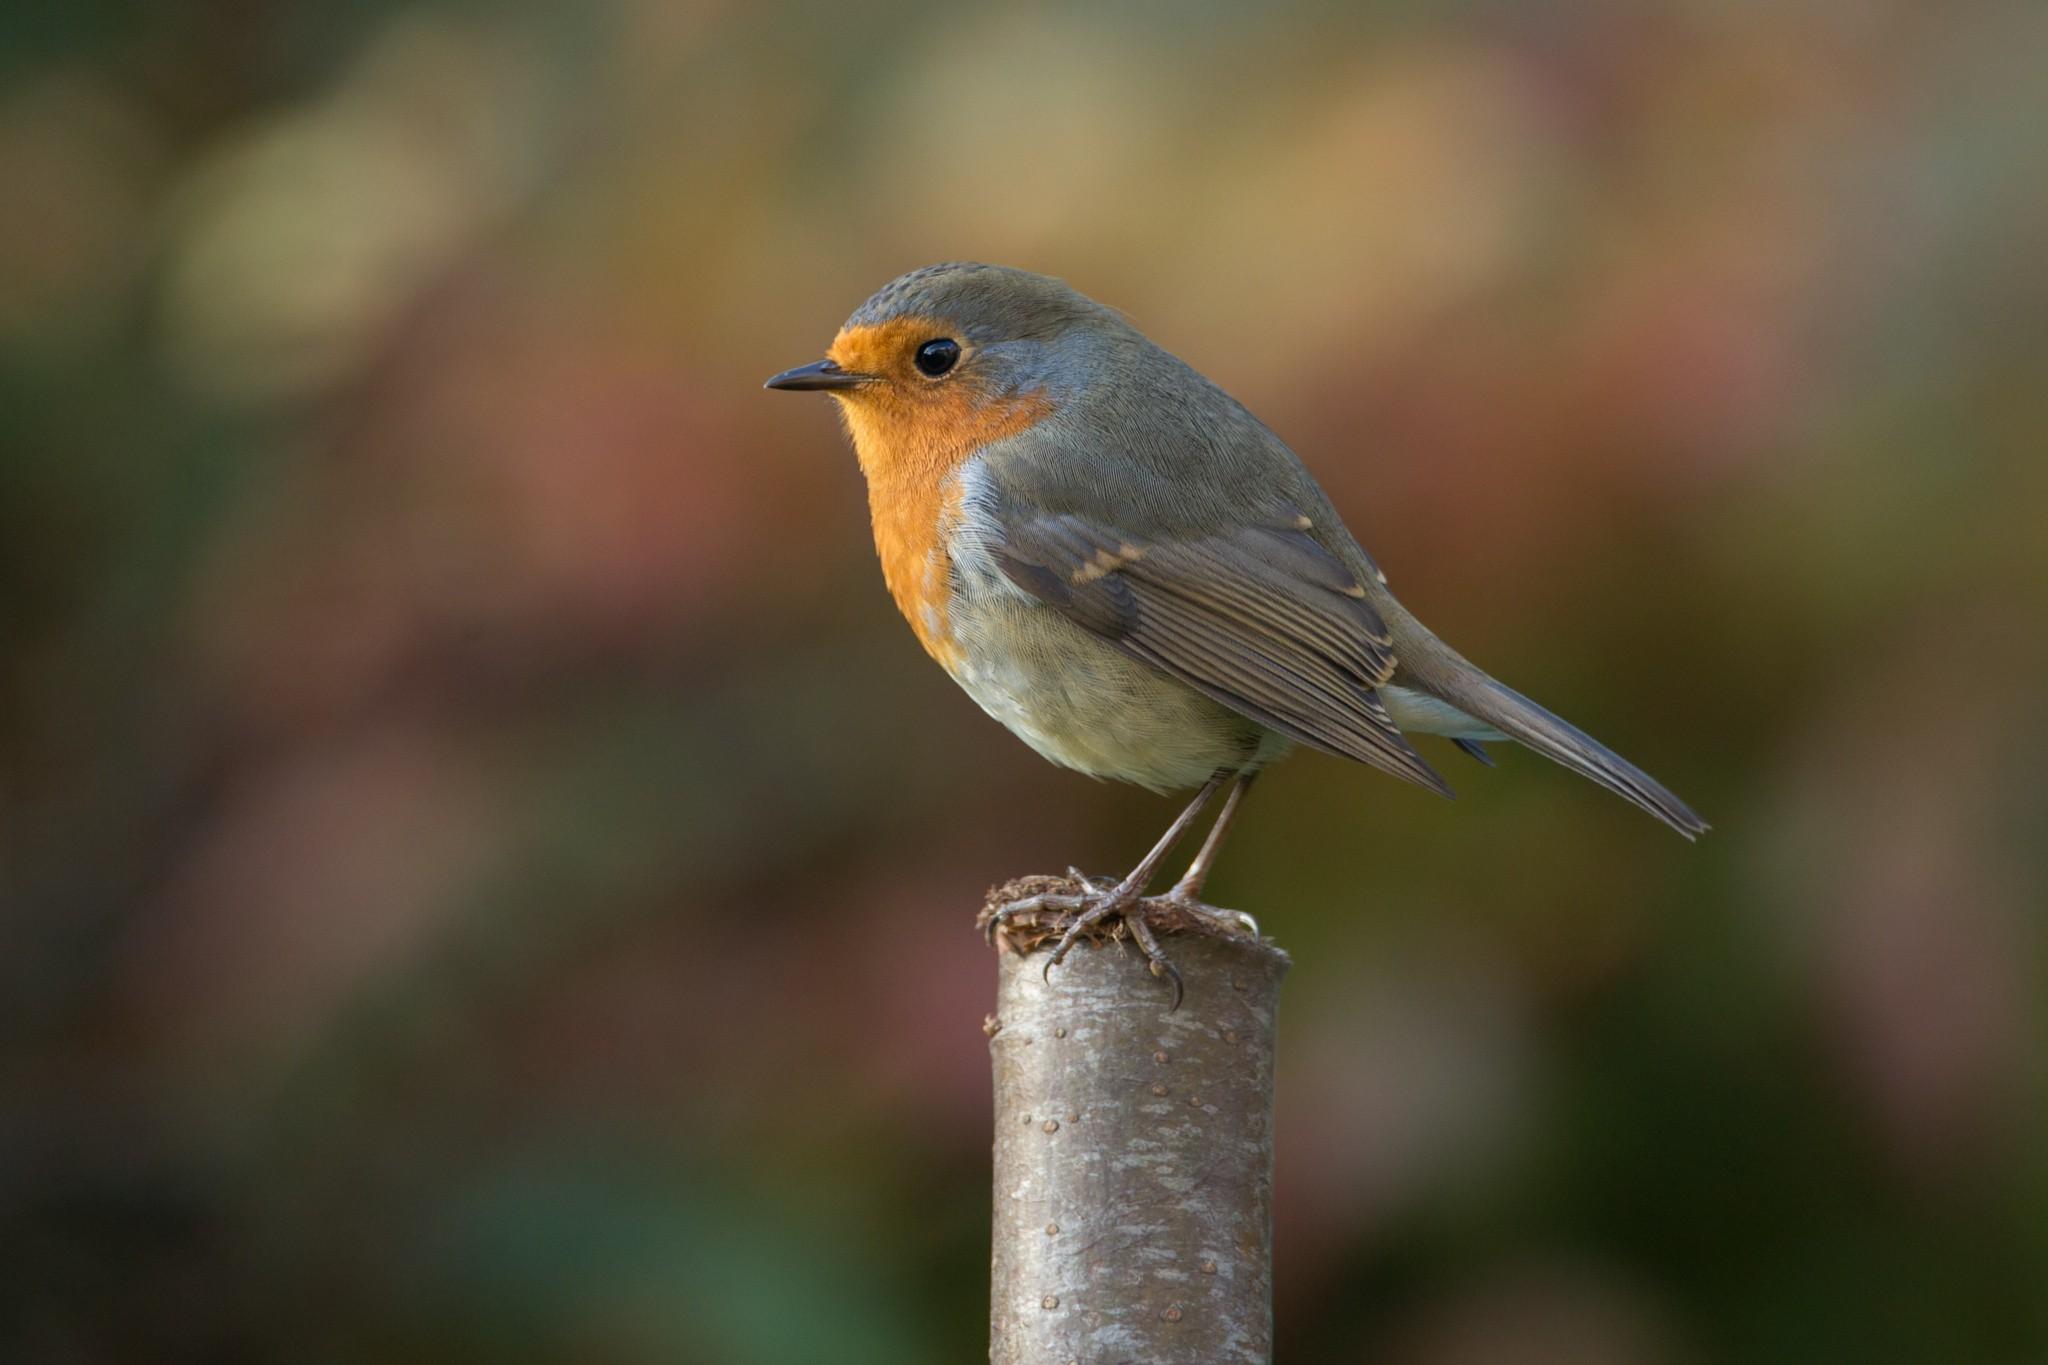 robin bird photography hd birds 4k wallpapers images